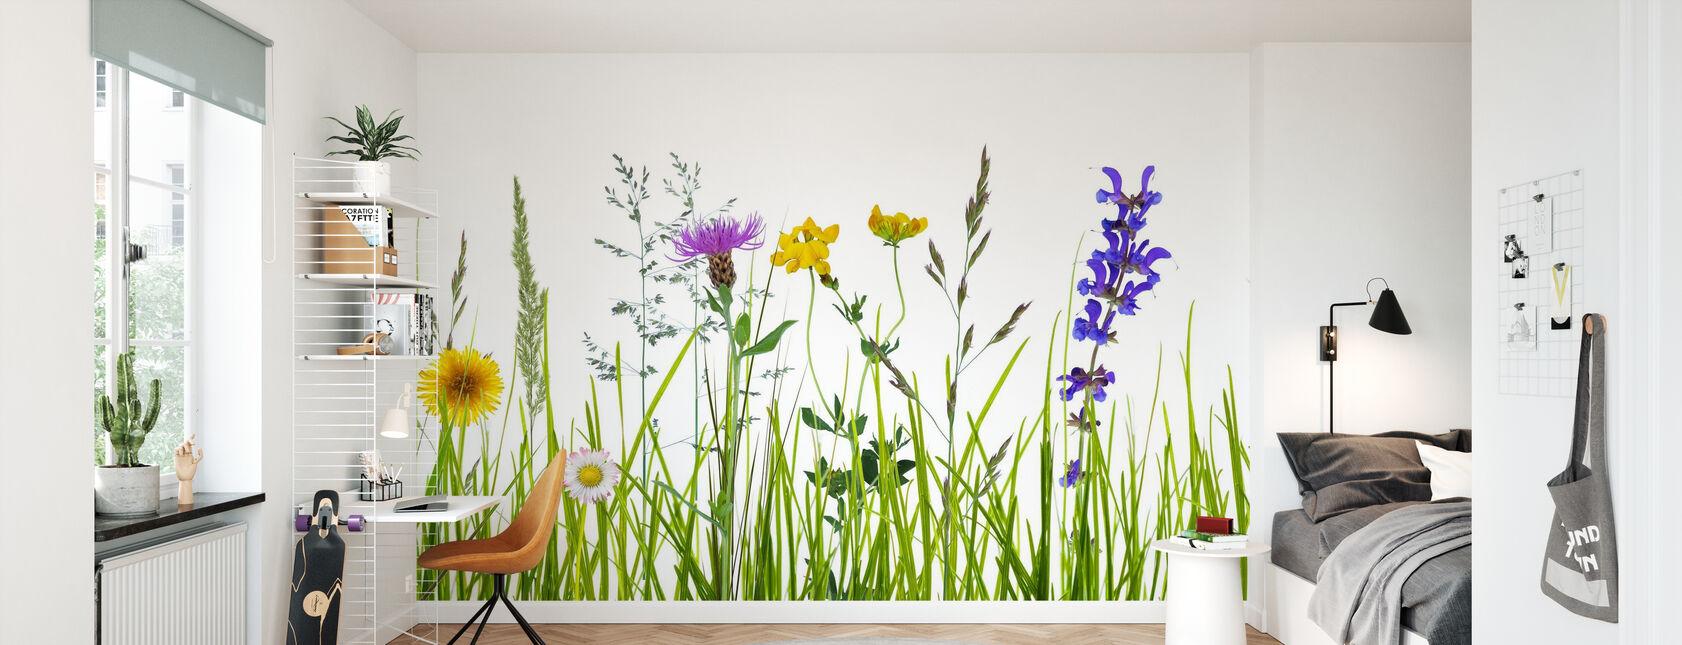 Wildflower Meadow - Wallpaper - Kids Room